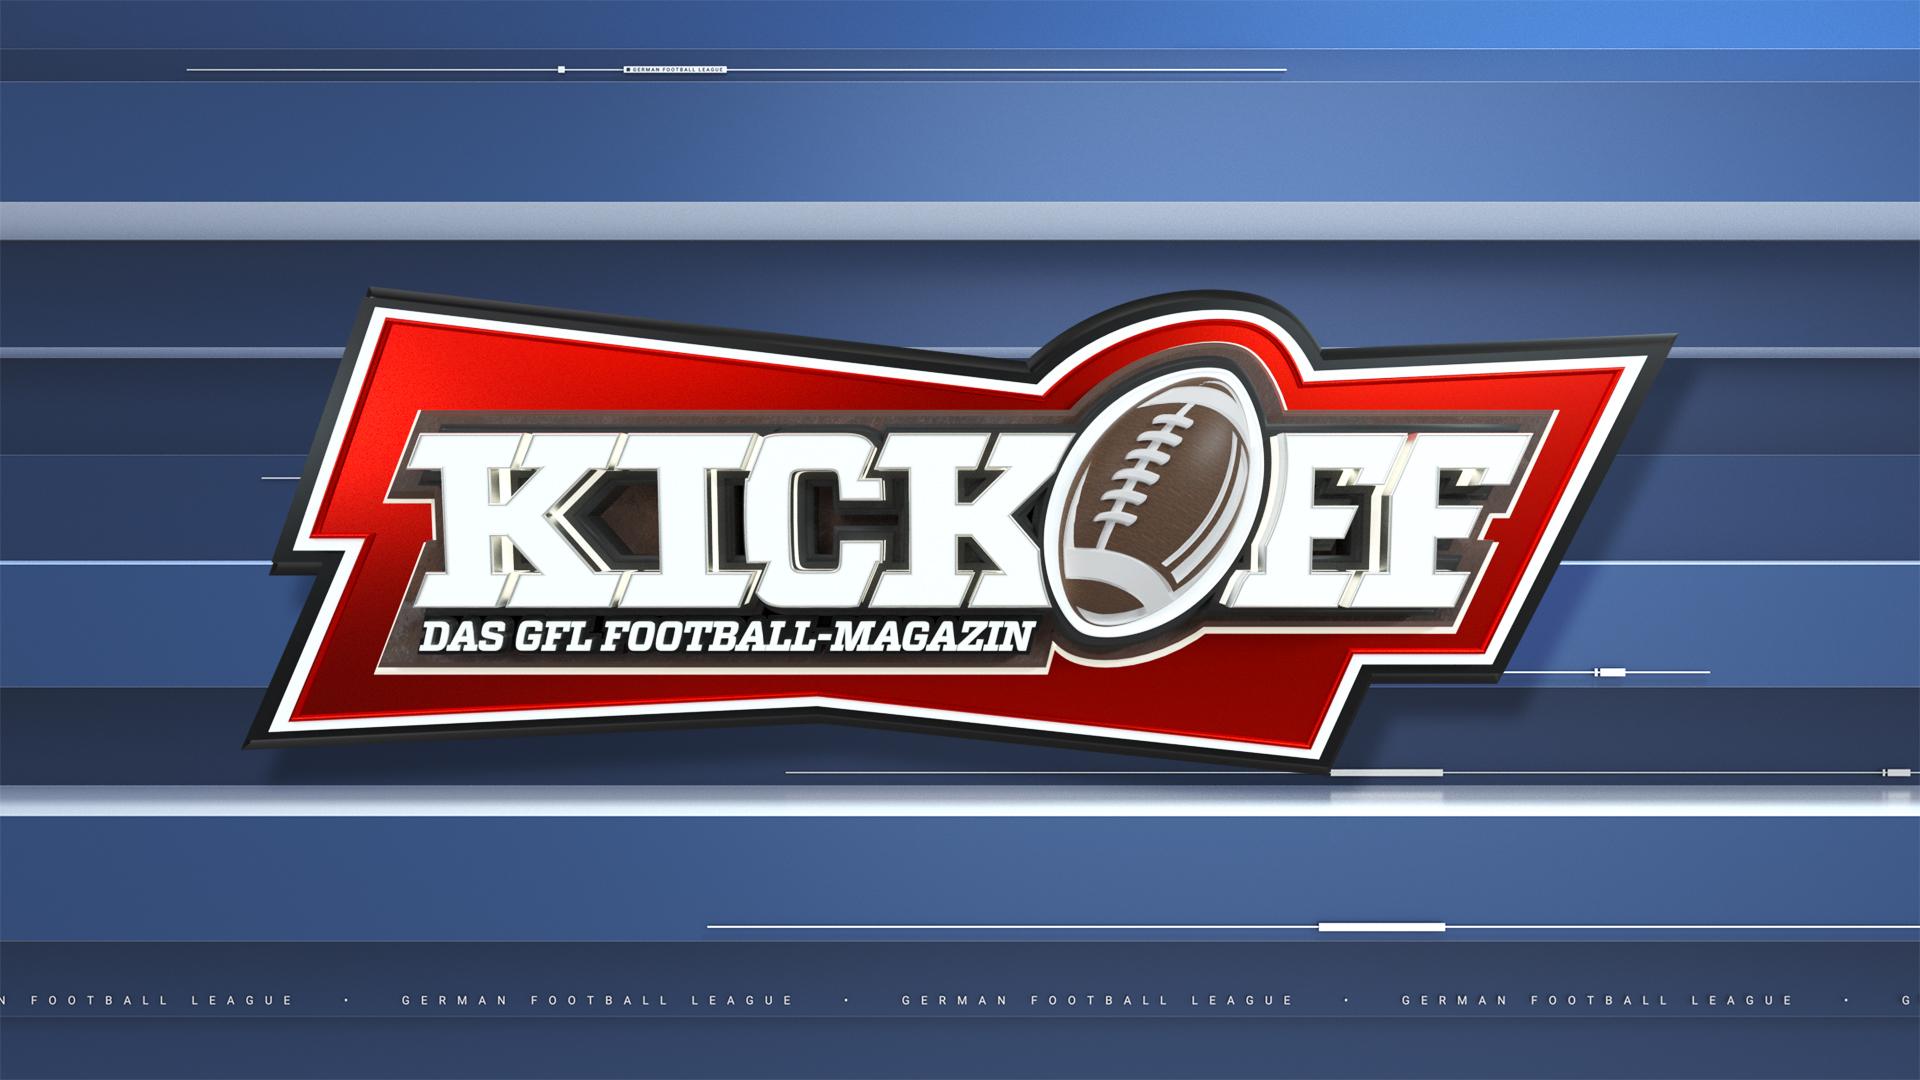 KickOff-Das-GFL-Football-Magazin-01